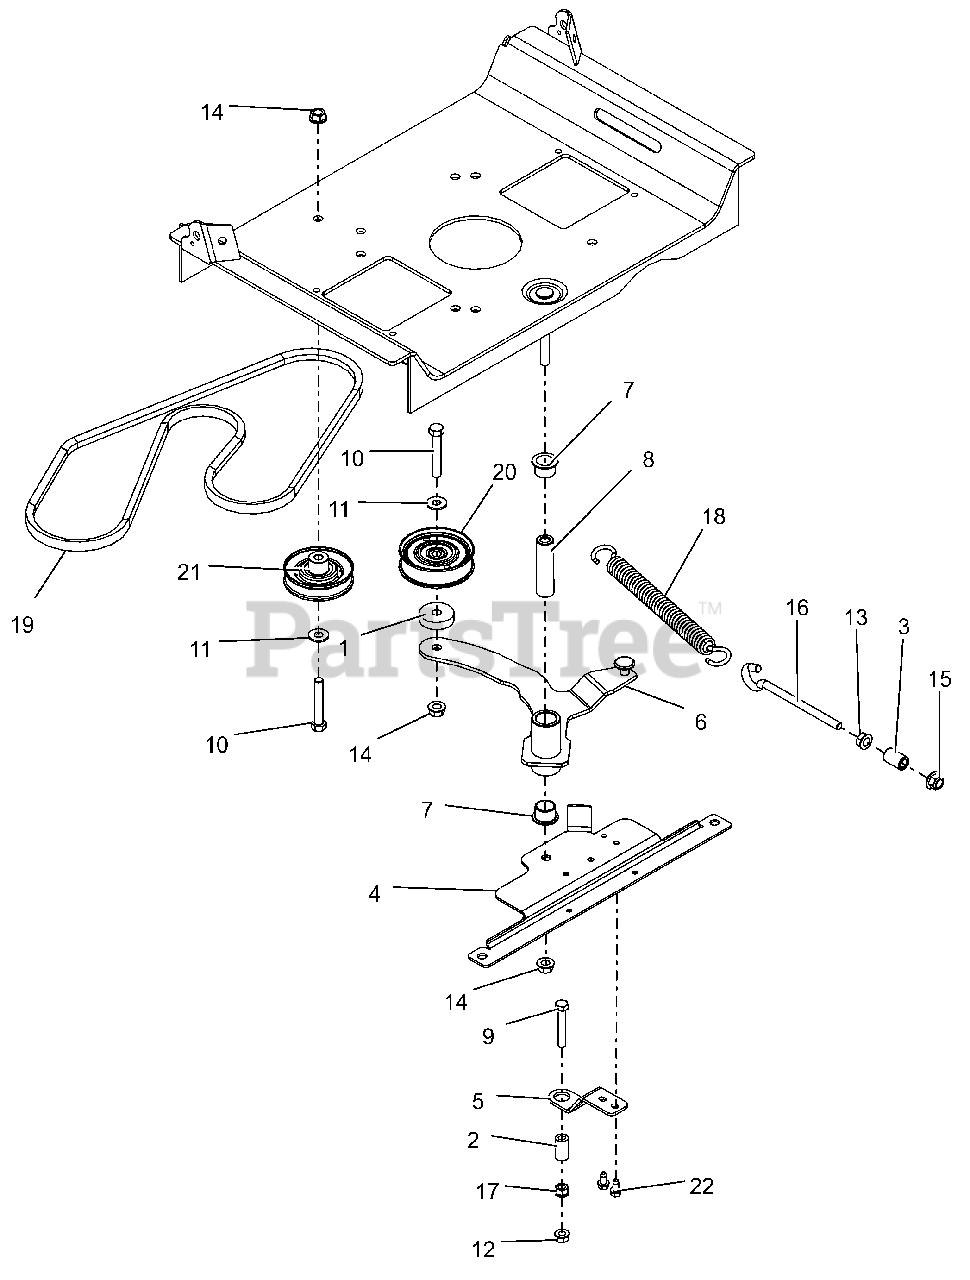 Gravely Drive Belt Diagram : gravely, drive, diagram, Gravely, 915200, Zero-Turn, Mower,, Kohler, 080000, Above), Transaxle, Drive, Parts, Lookup, Diagrams, PartsTree